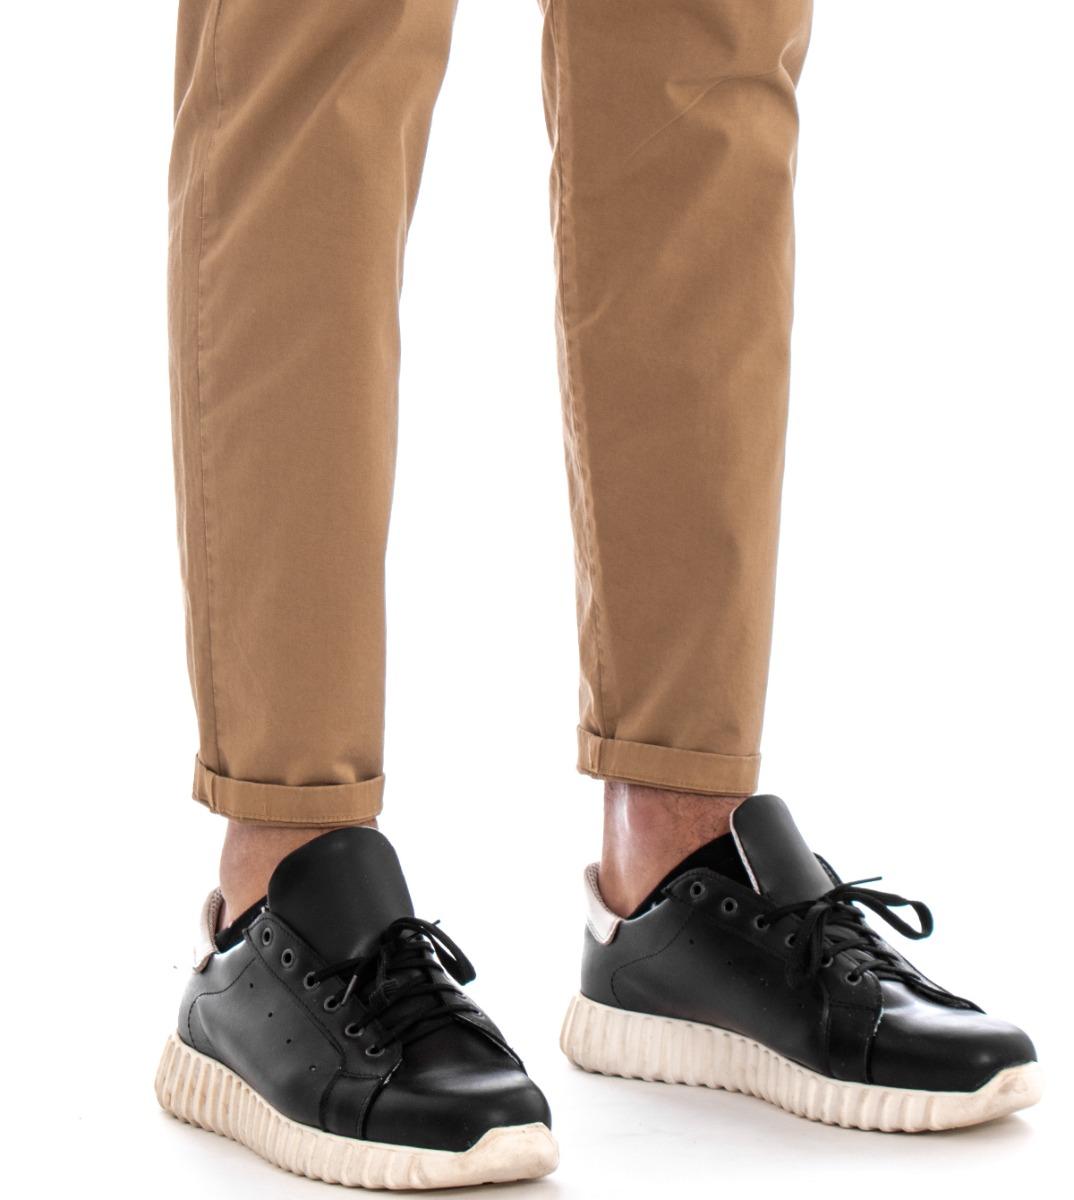 Pantalone-Uomo-Cargo-Tasca-America-Kaki-Tinta-Unita-Cotone-Casual-GIOSAL miniatura 5